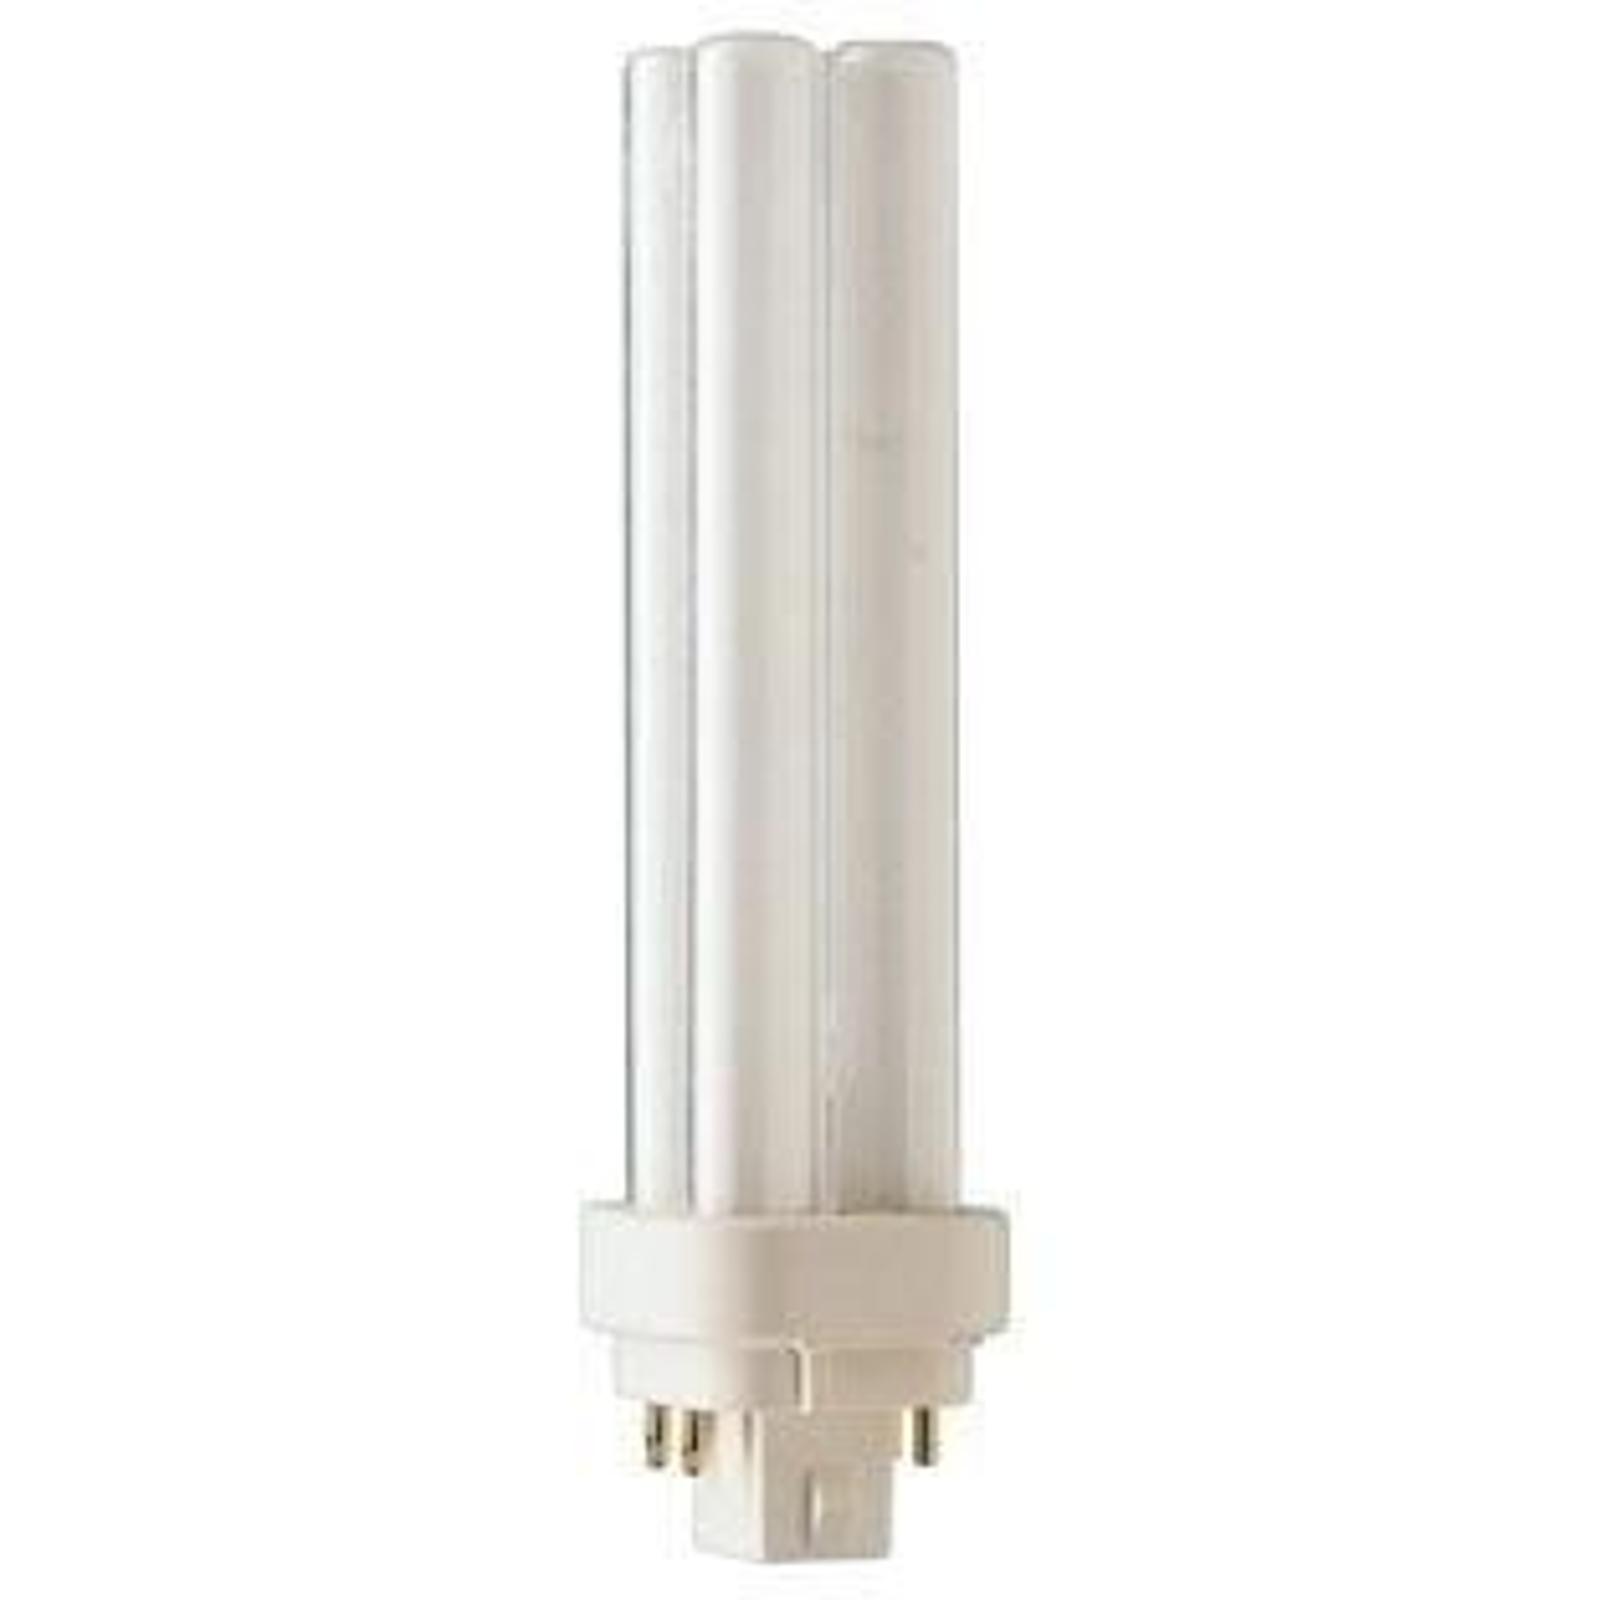 G24q 26W 827 Kompaktleuchtstofflampe DULUX D/E